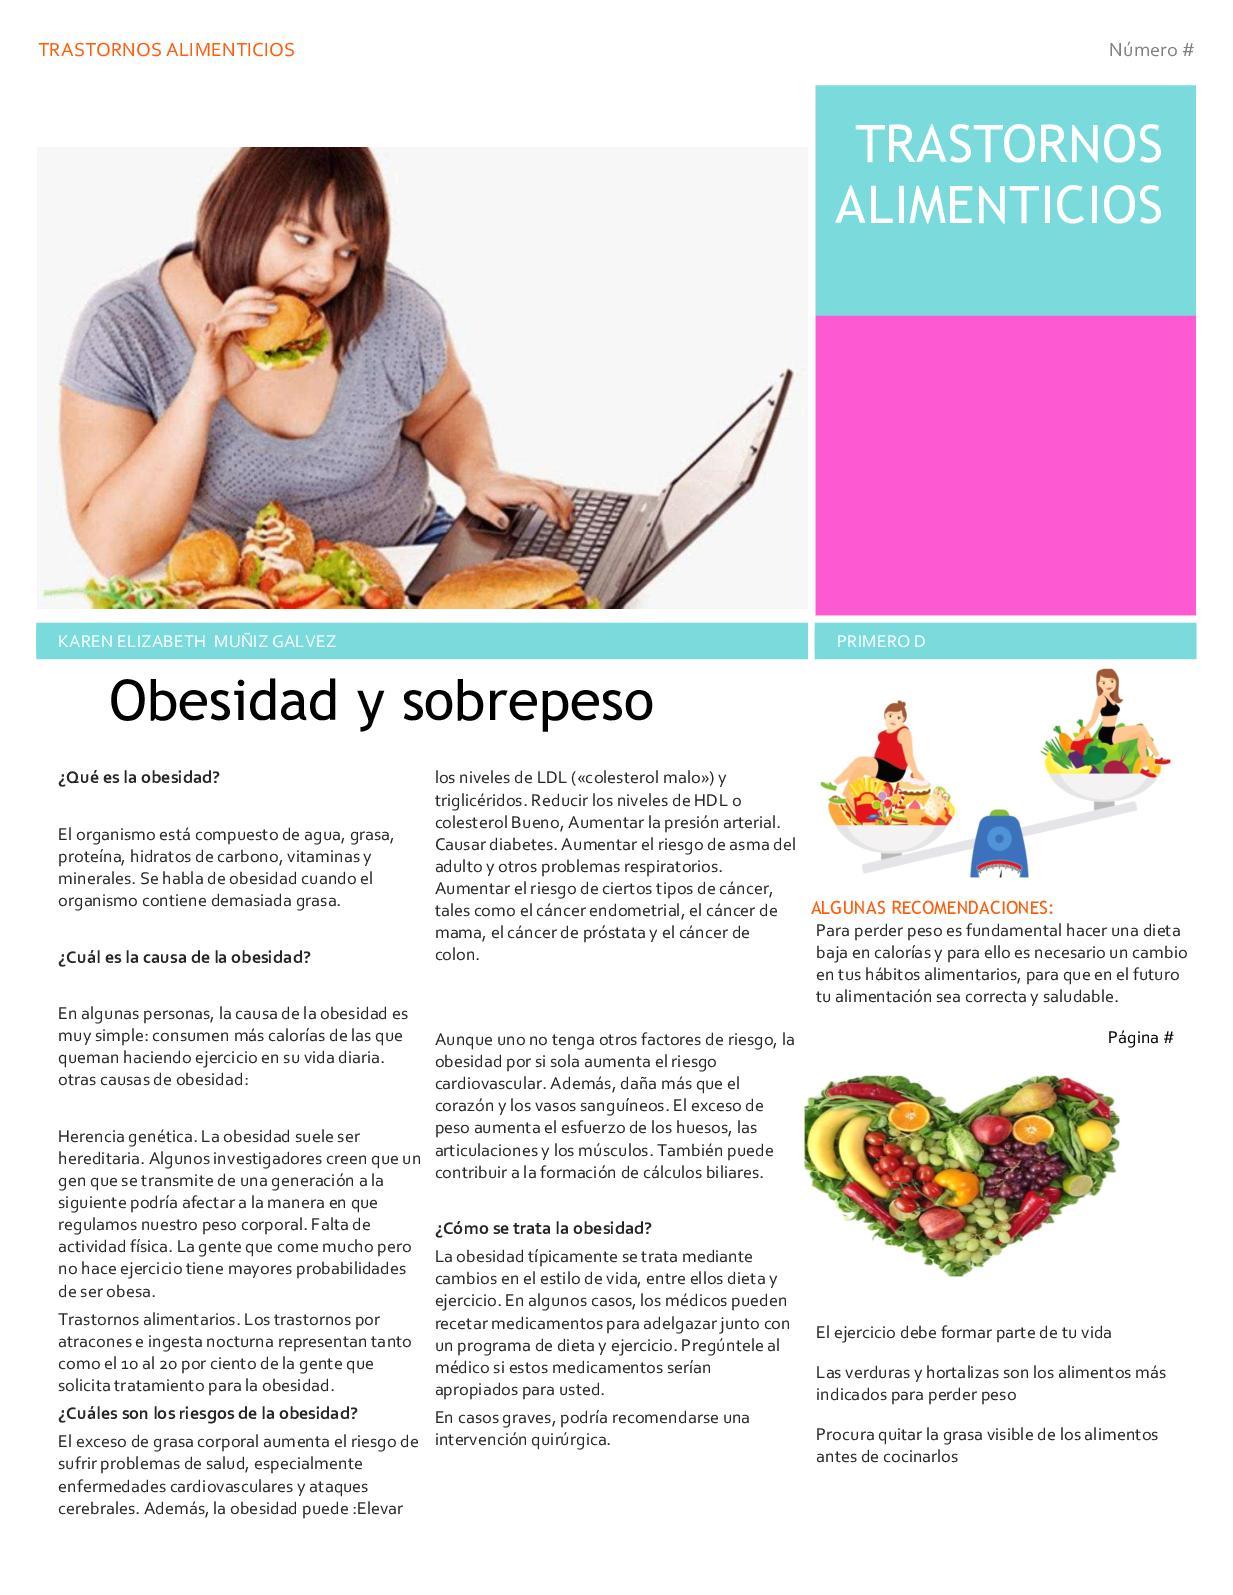 dieta perdida de peso repentina diabetes